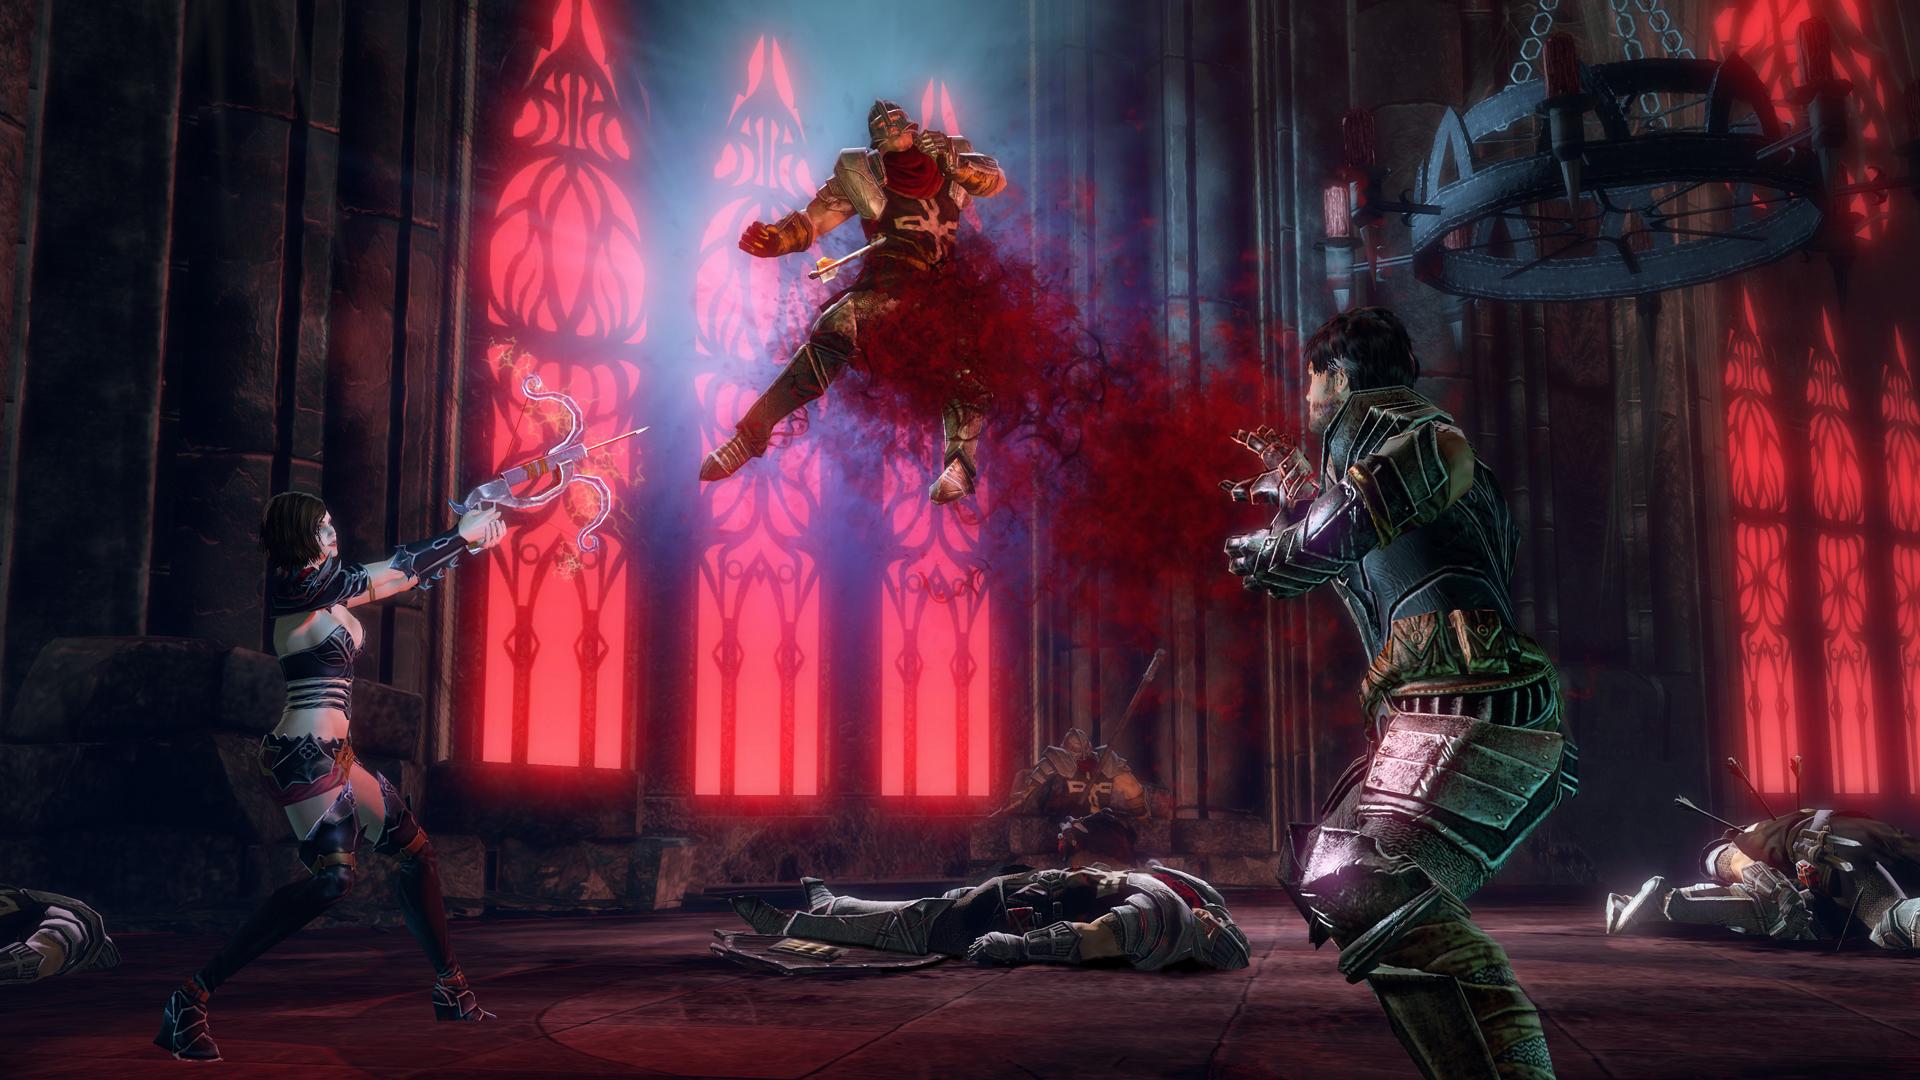 Blood Knights XBLA release delayed till December